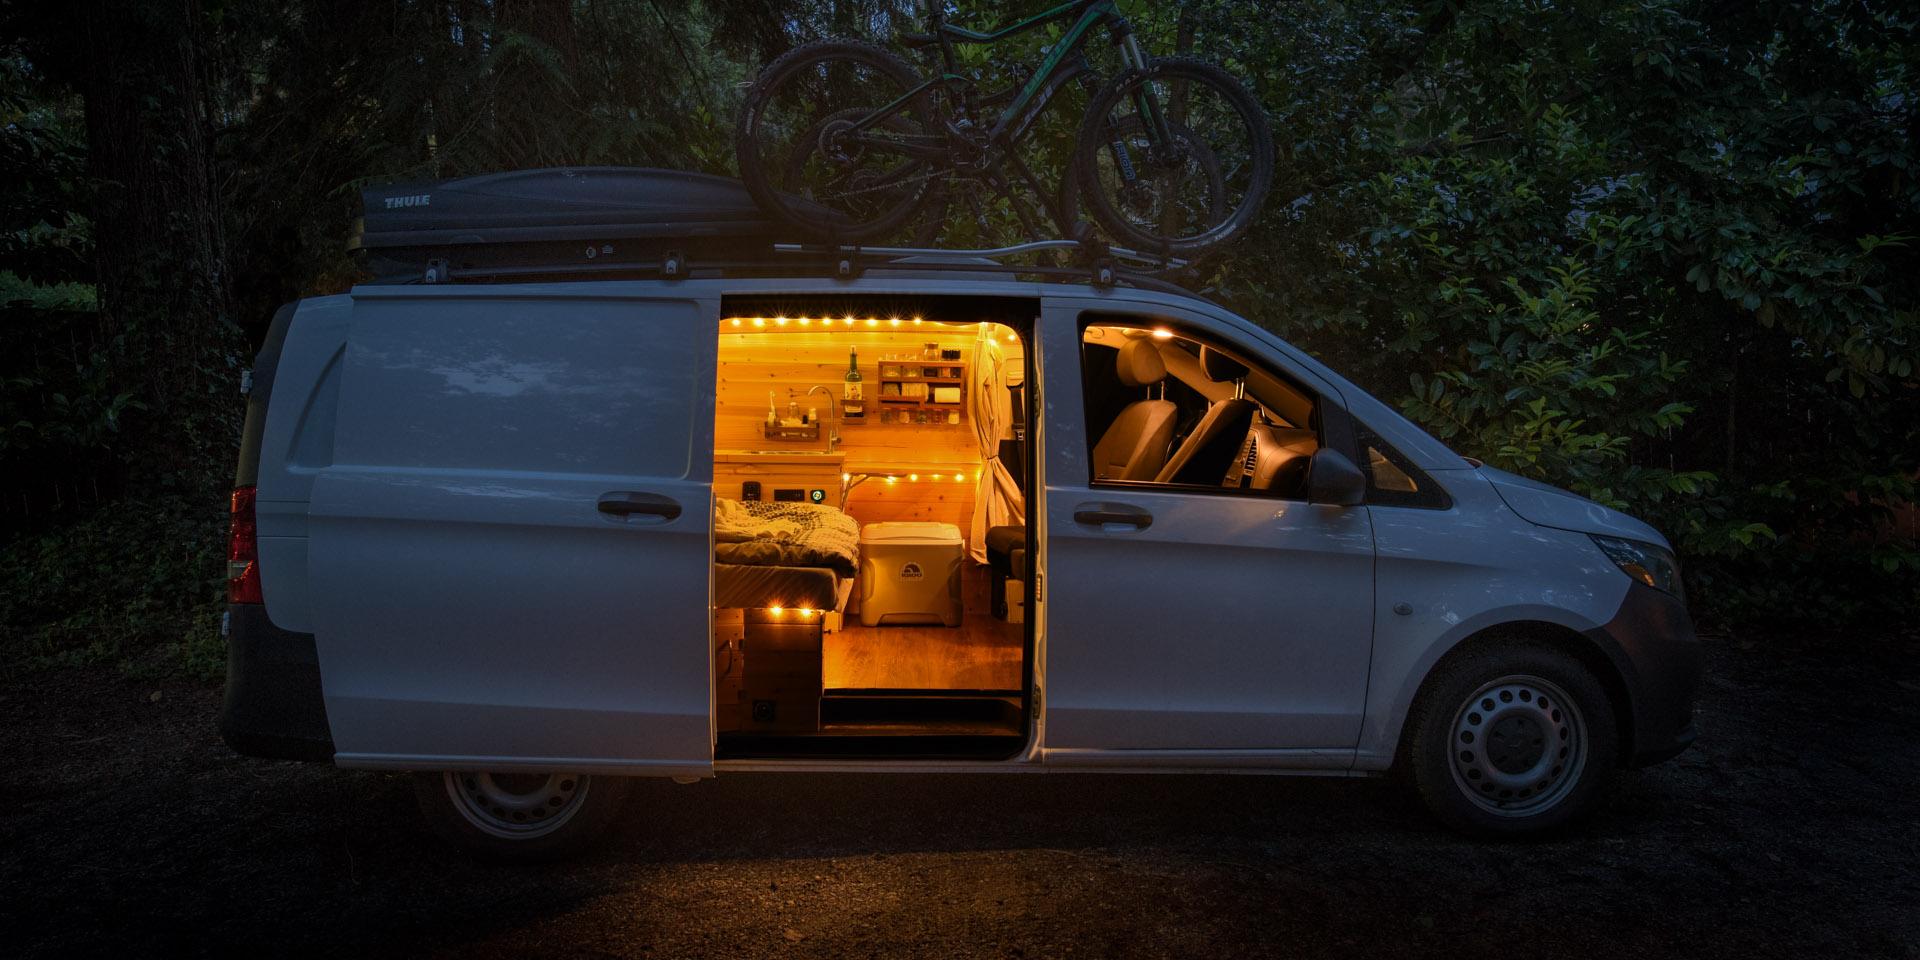 mercedes metris camper conversion at night